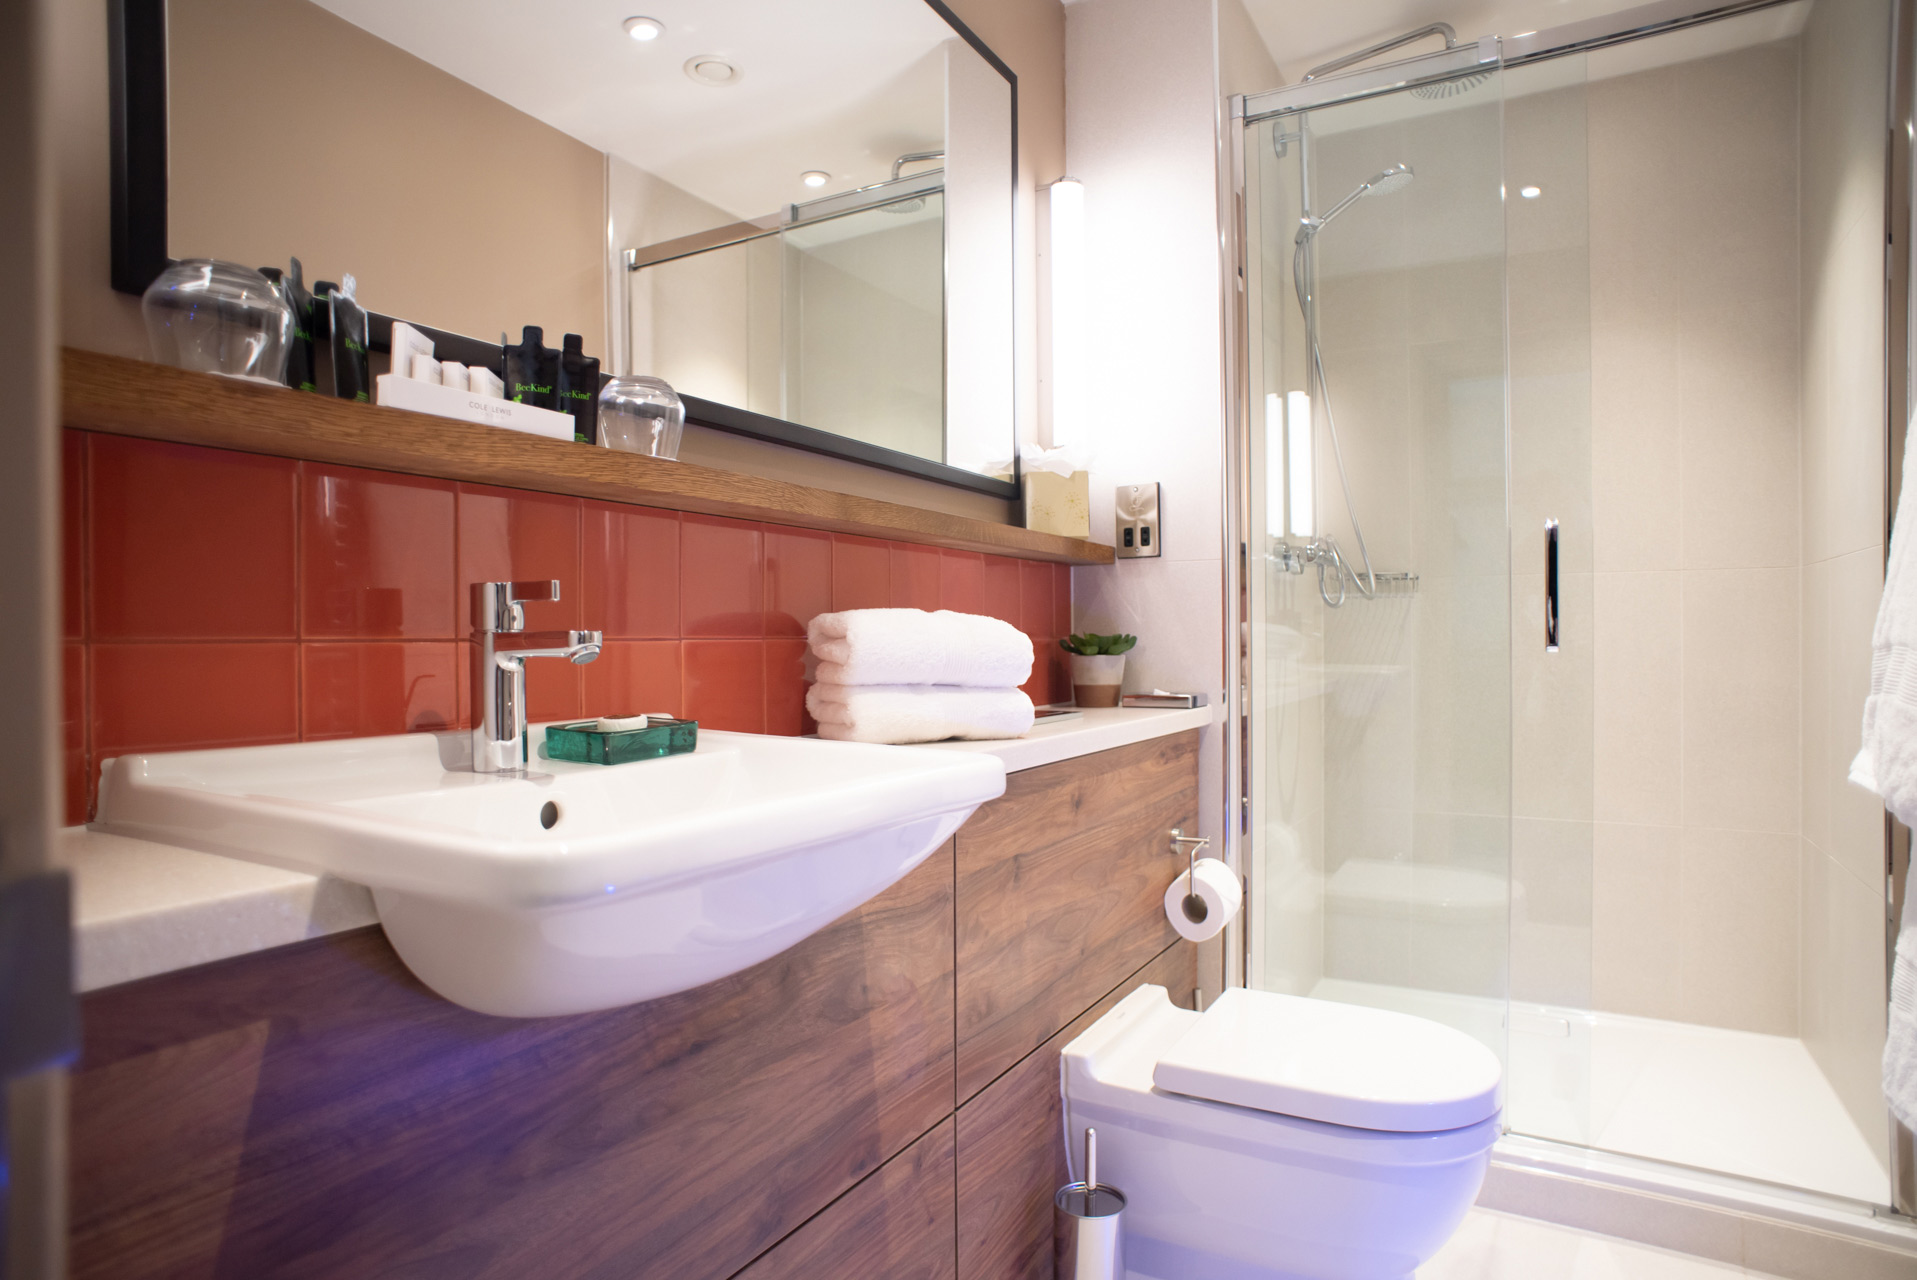 The-Counting-House-STD-Bathroom.jpg